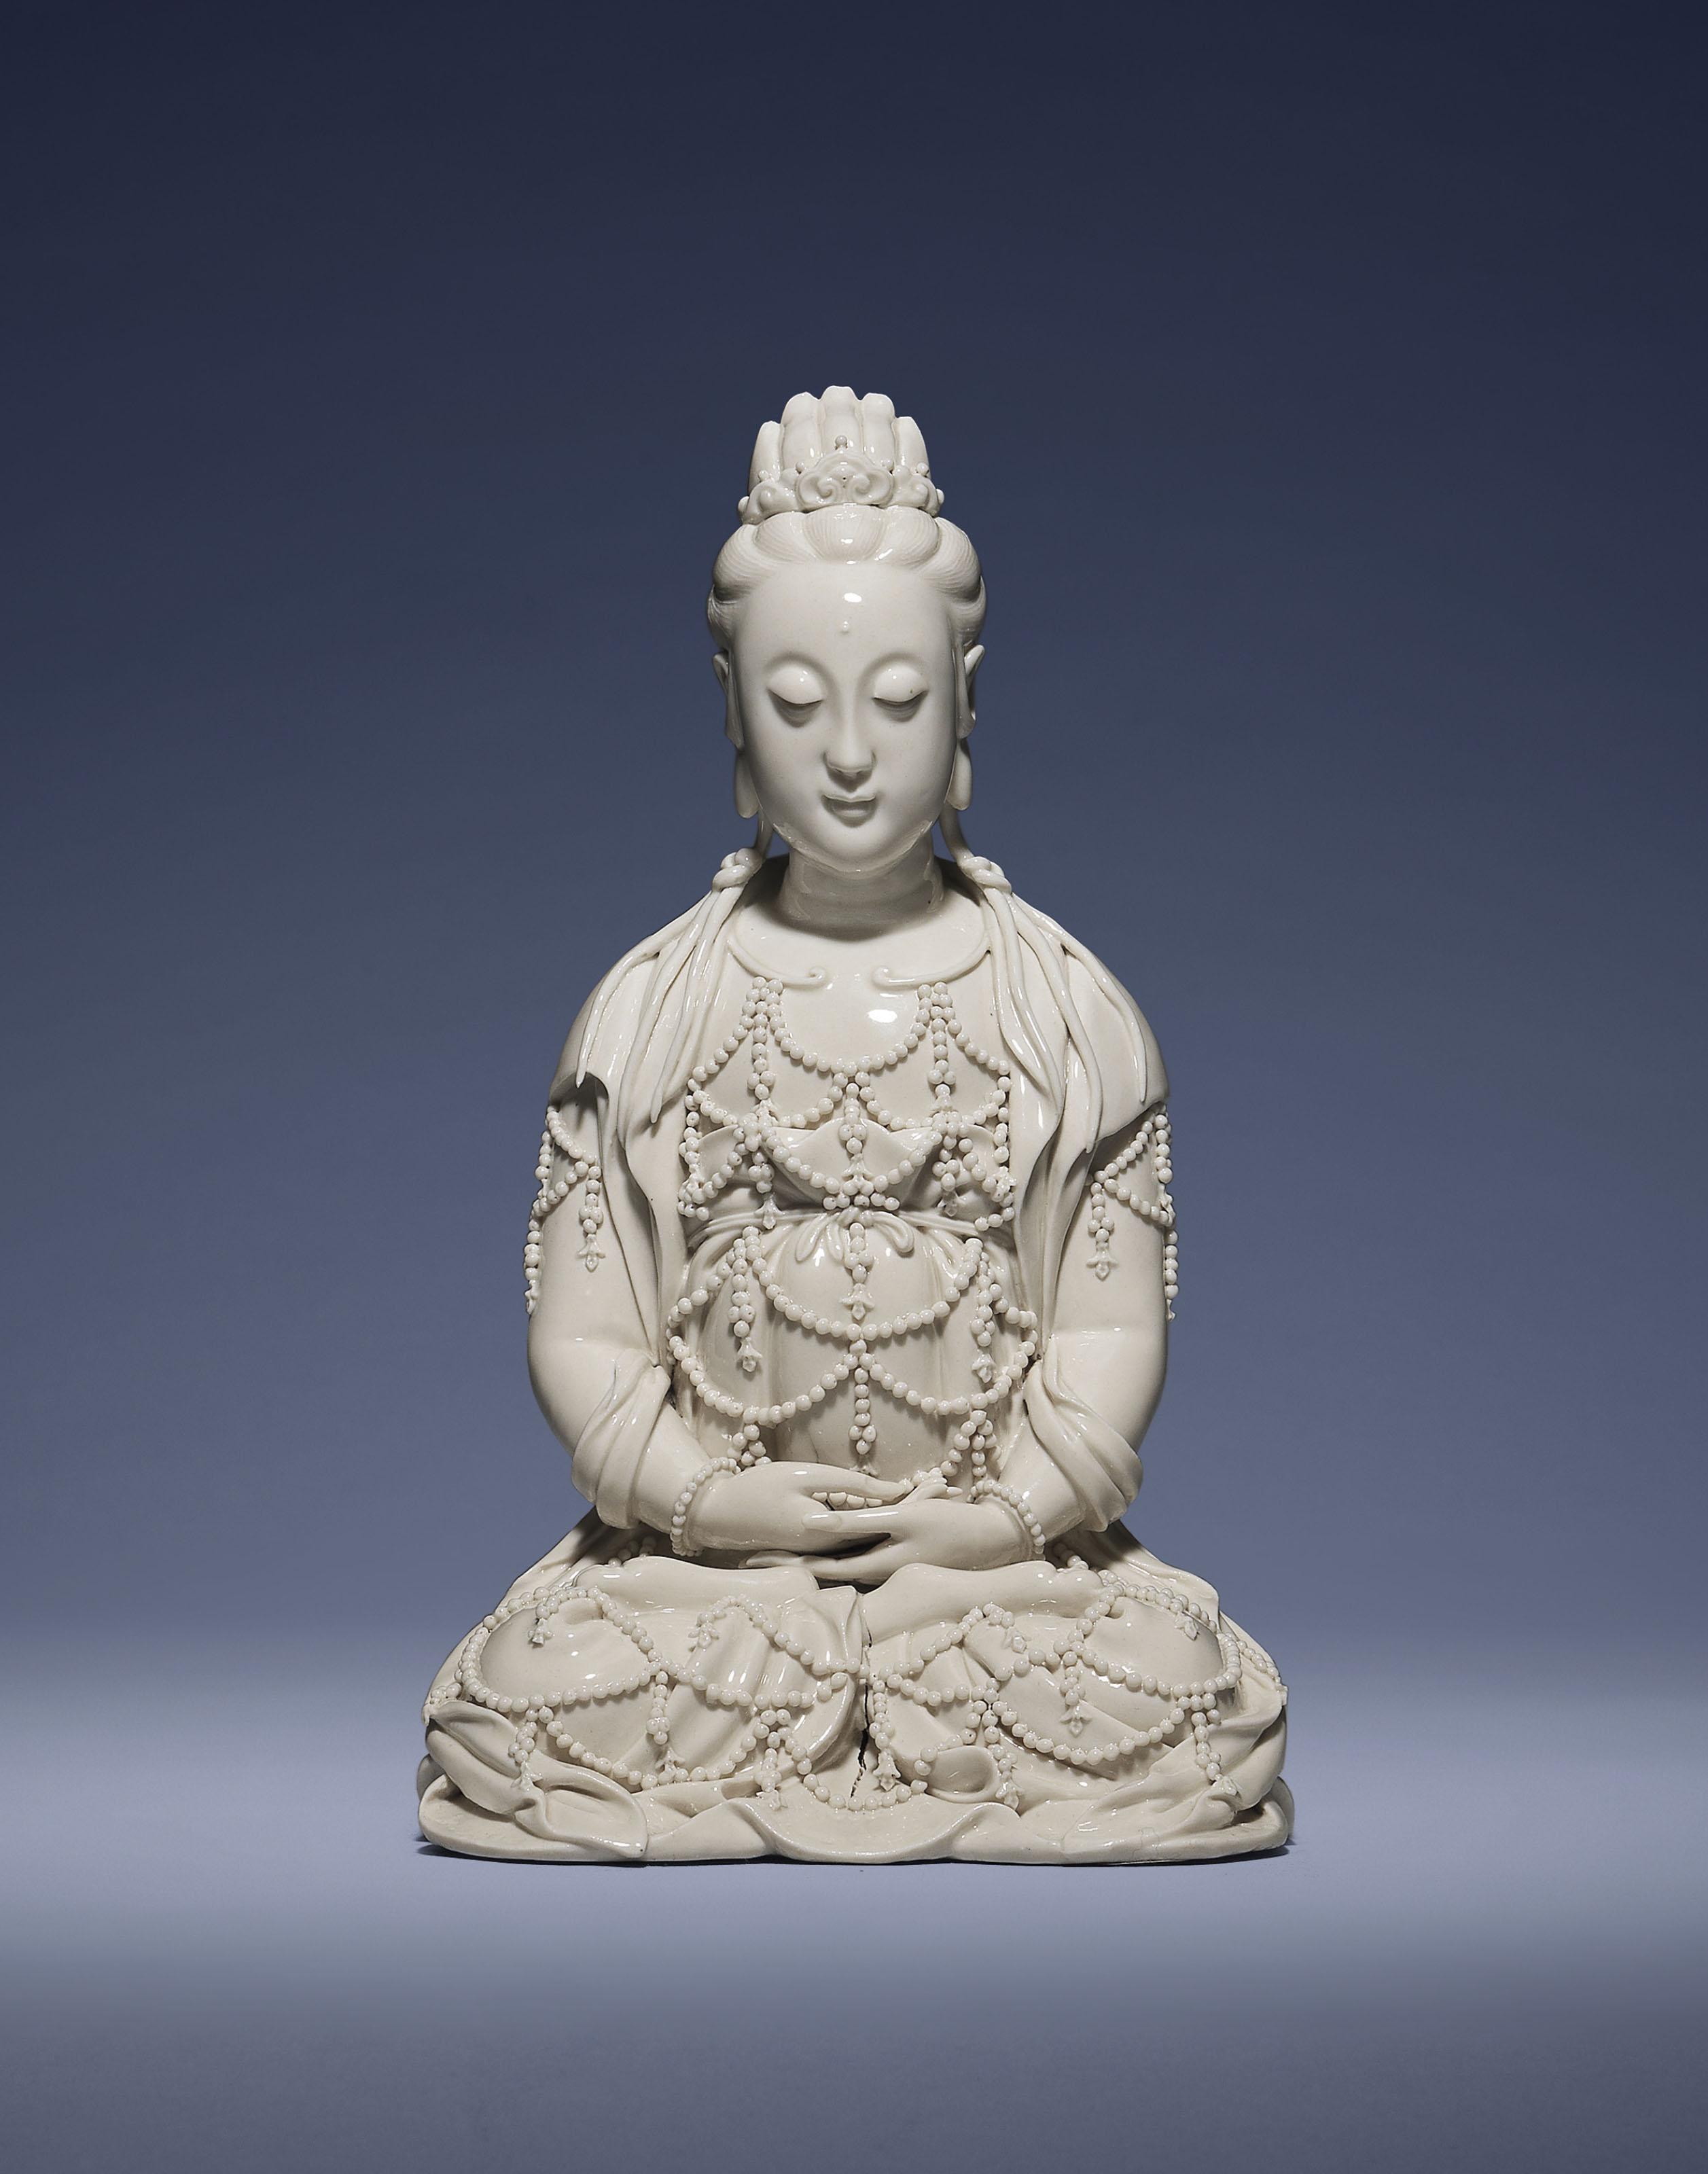 A DEHUA SEATED FIGURE OF XIWAN